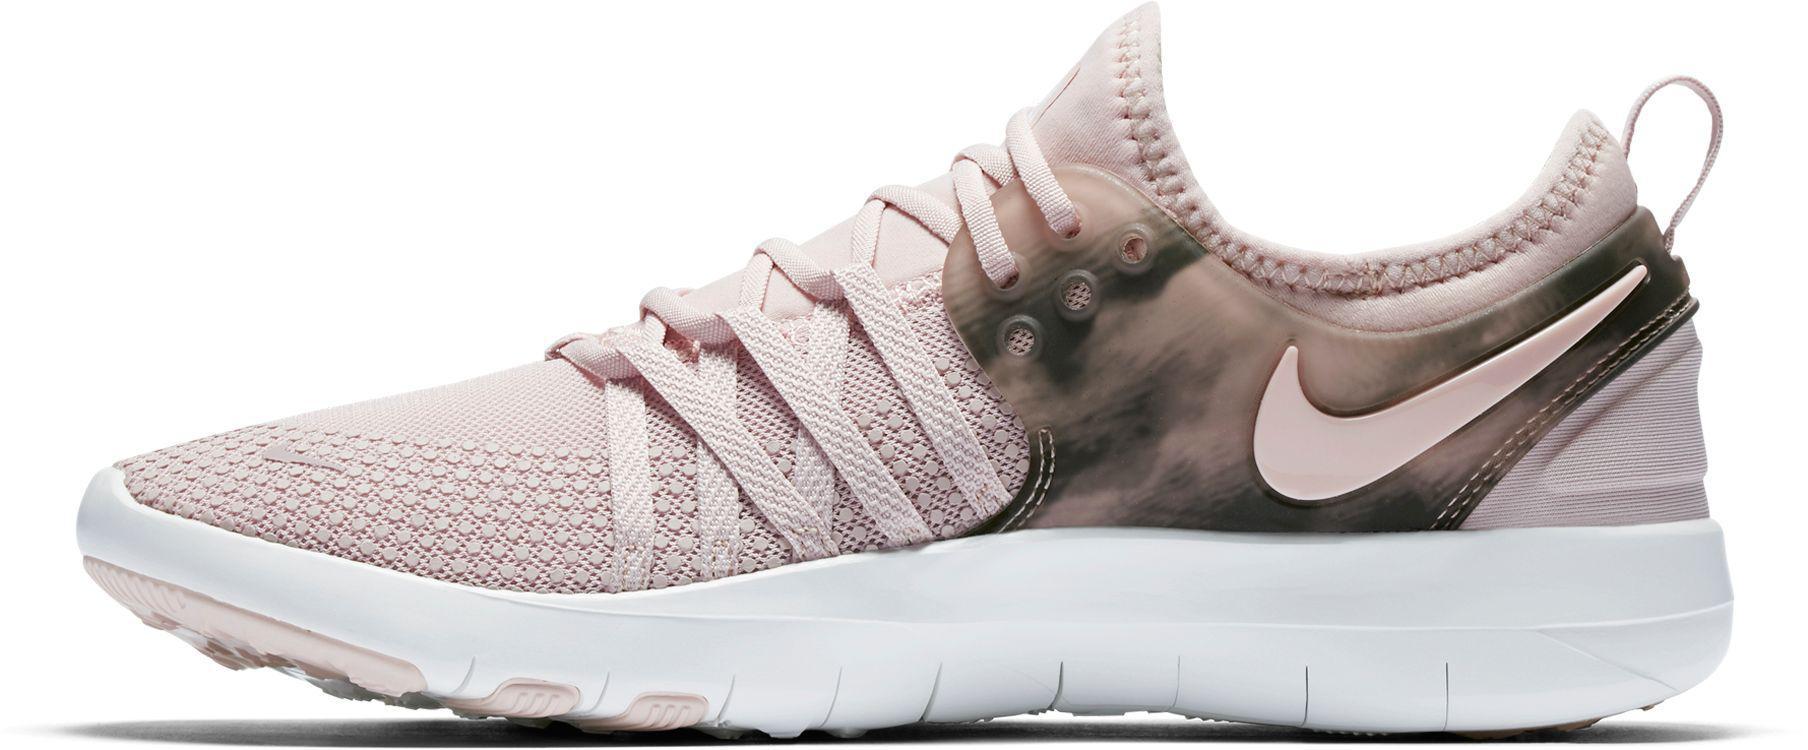 faa0e257195 switzerland white pink womens nike free trainer 7.0 shoes 5f2ba 92874